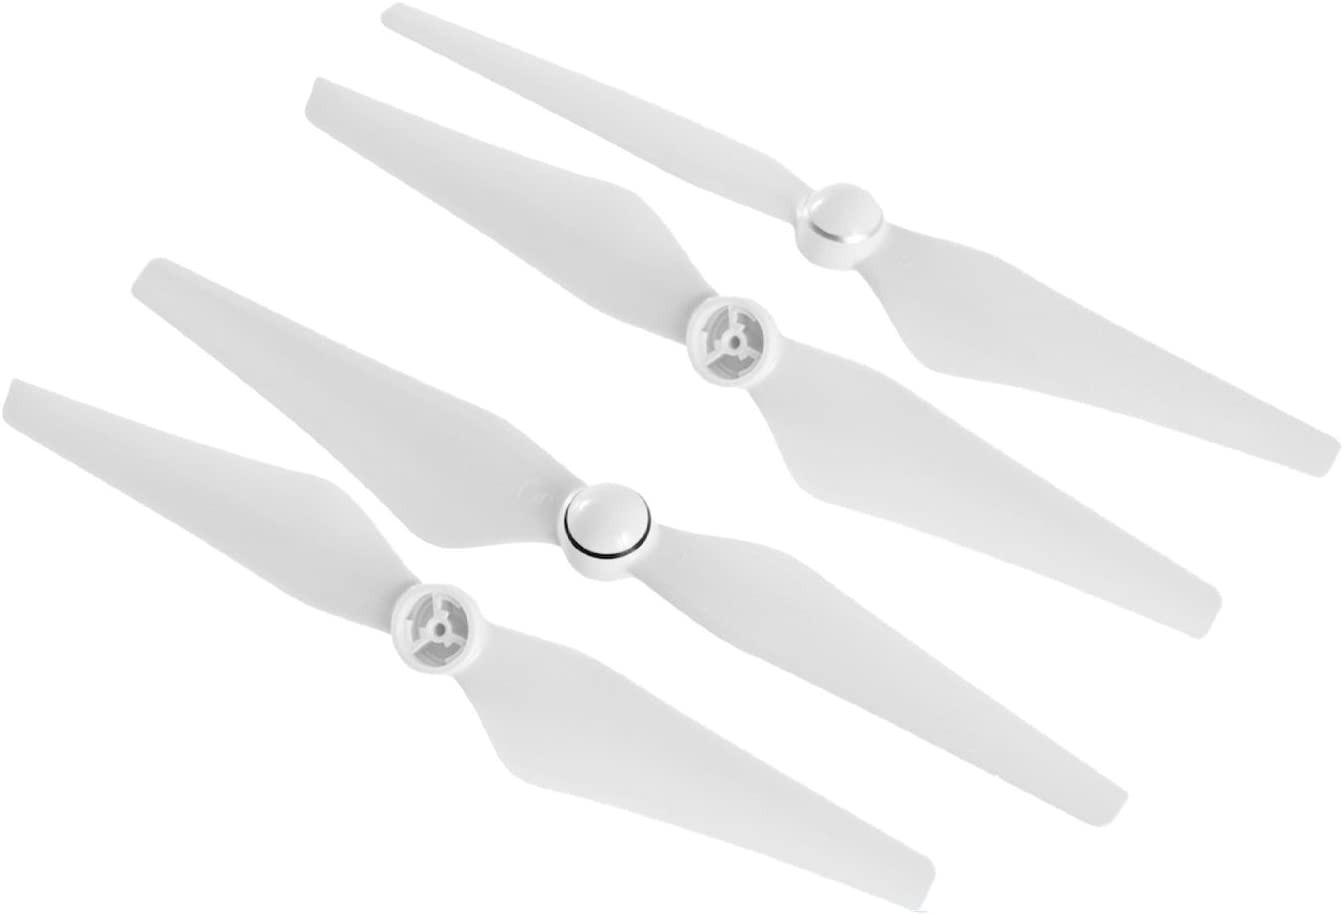 DJI Phantom 4 Series 9450S Quick Release Propellers, 2 Pairs